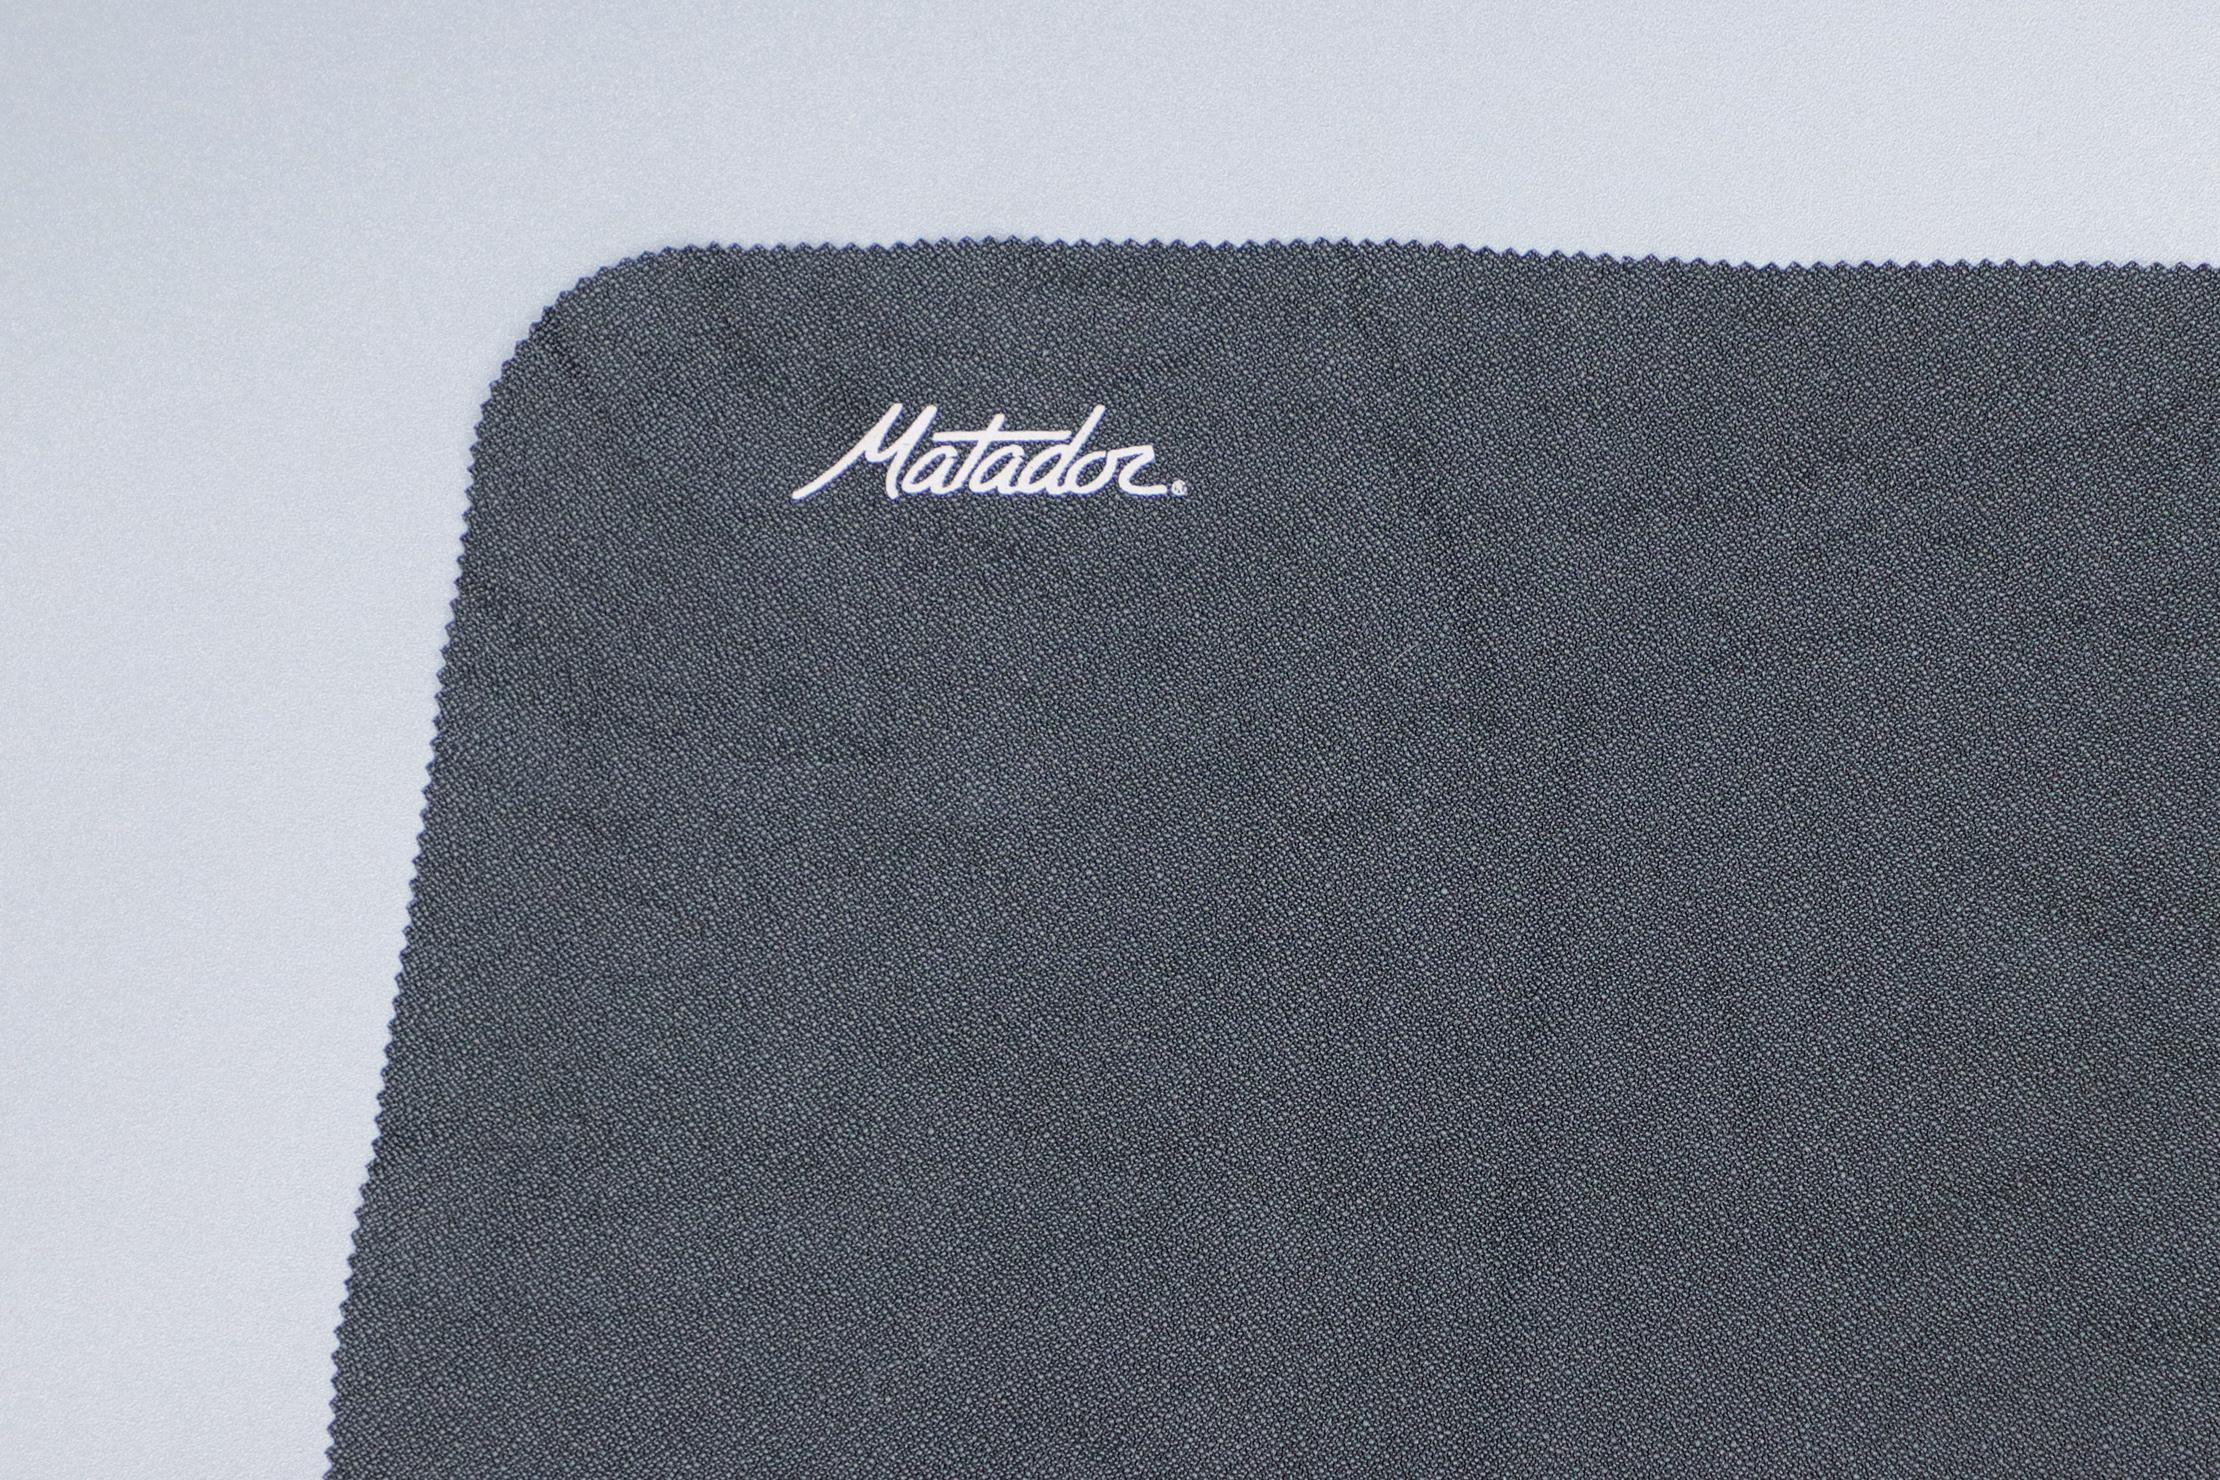 Matador Ultralight Travel Towel logo